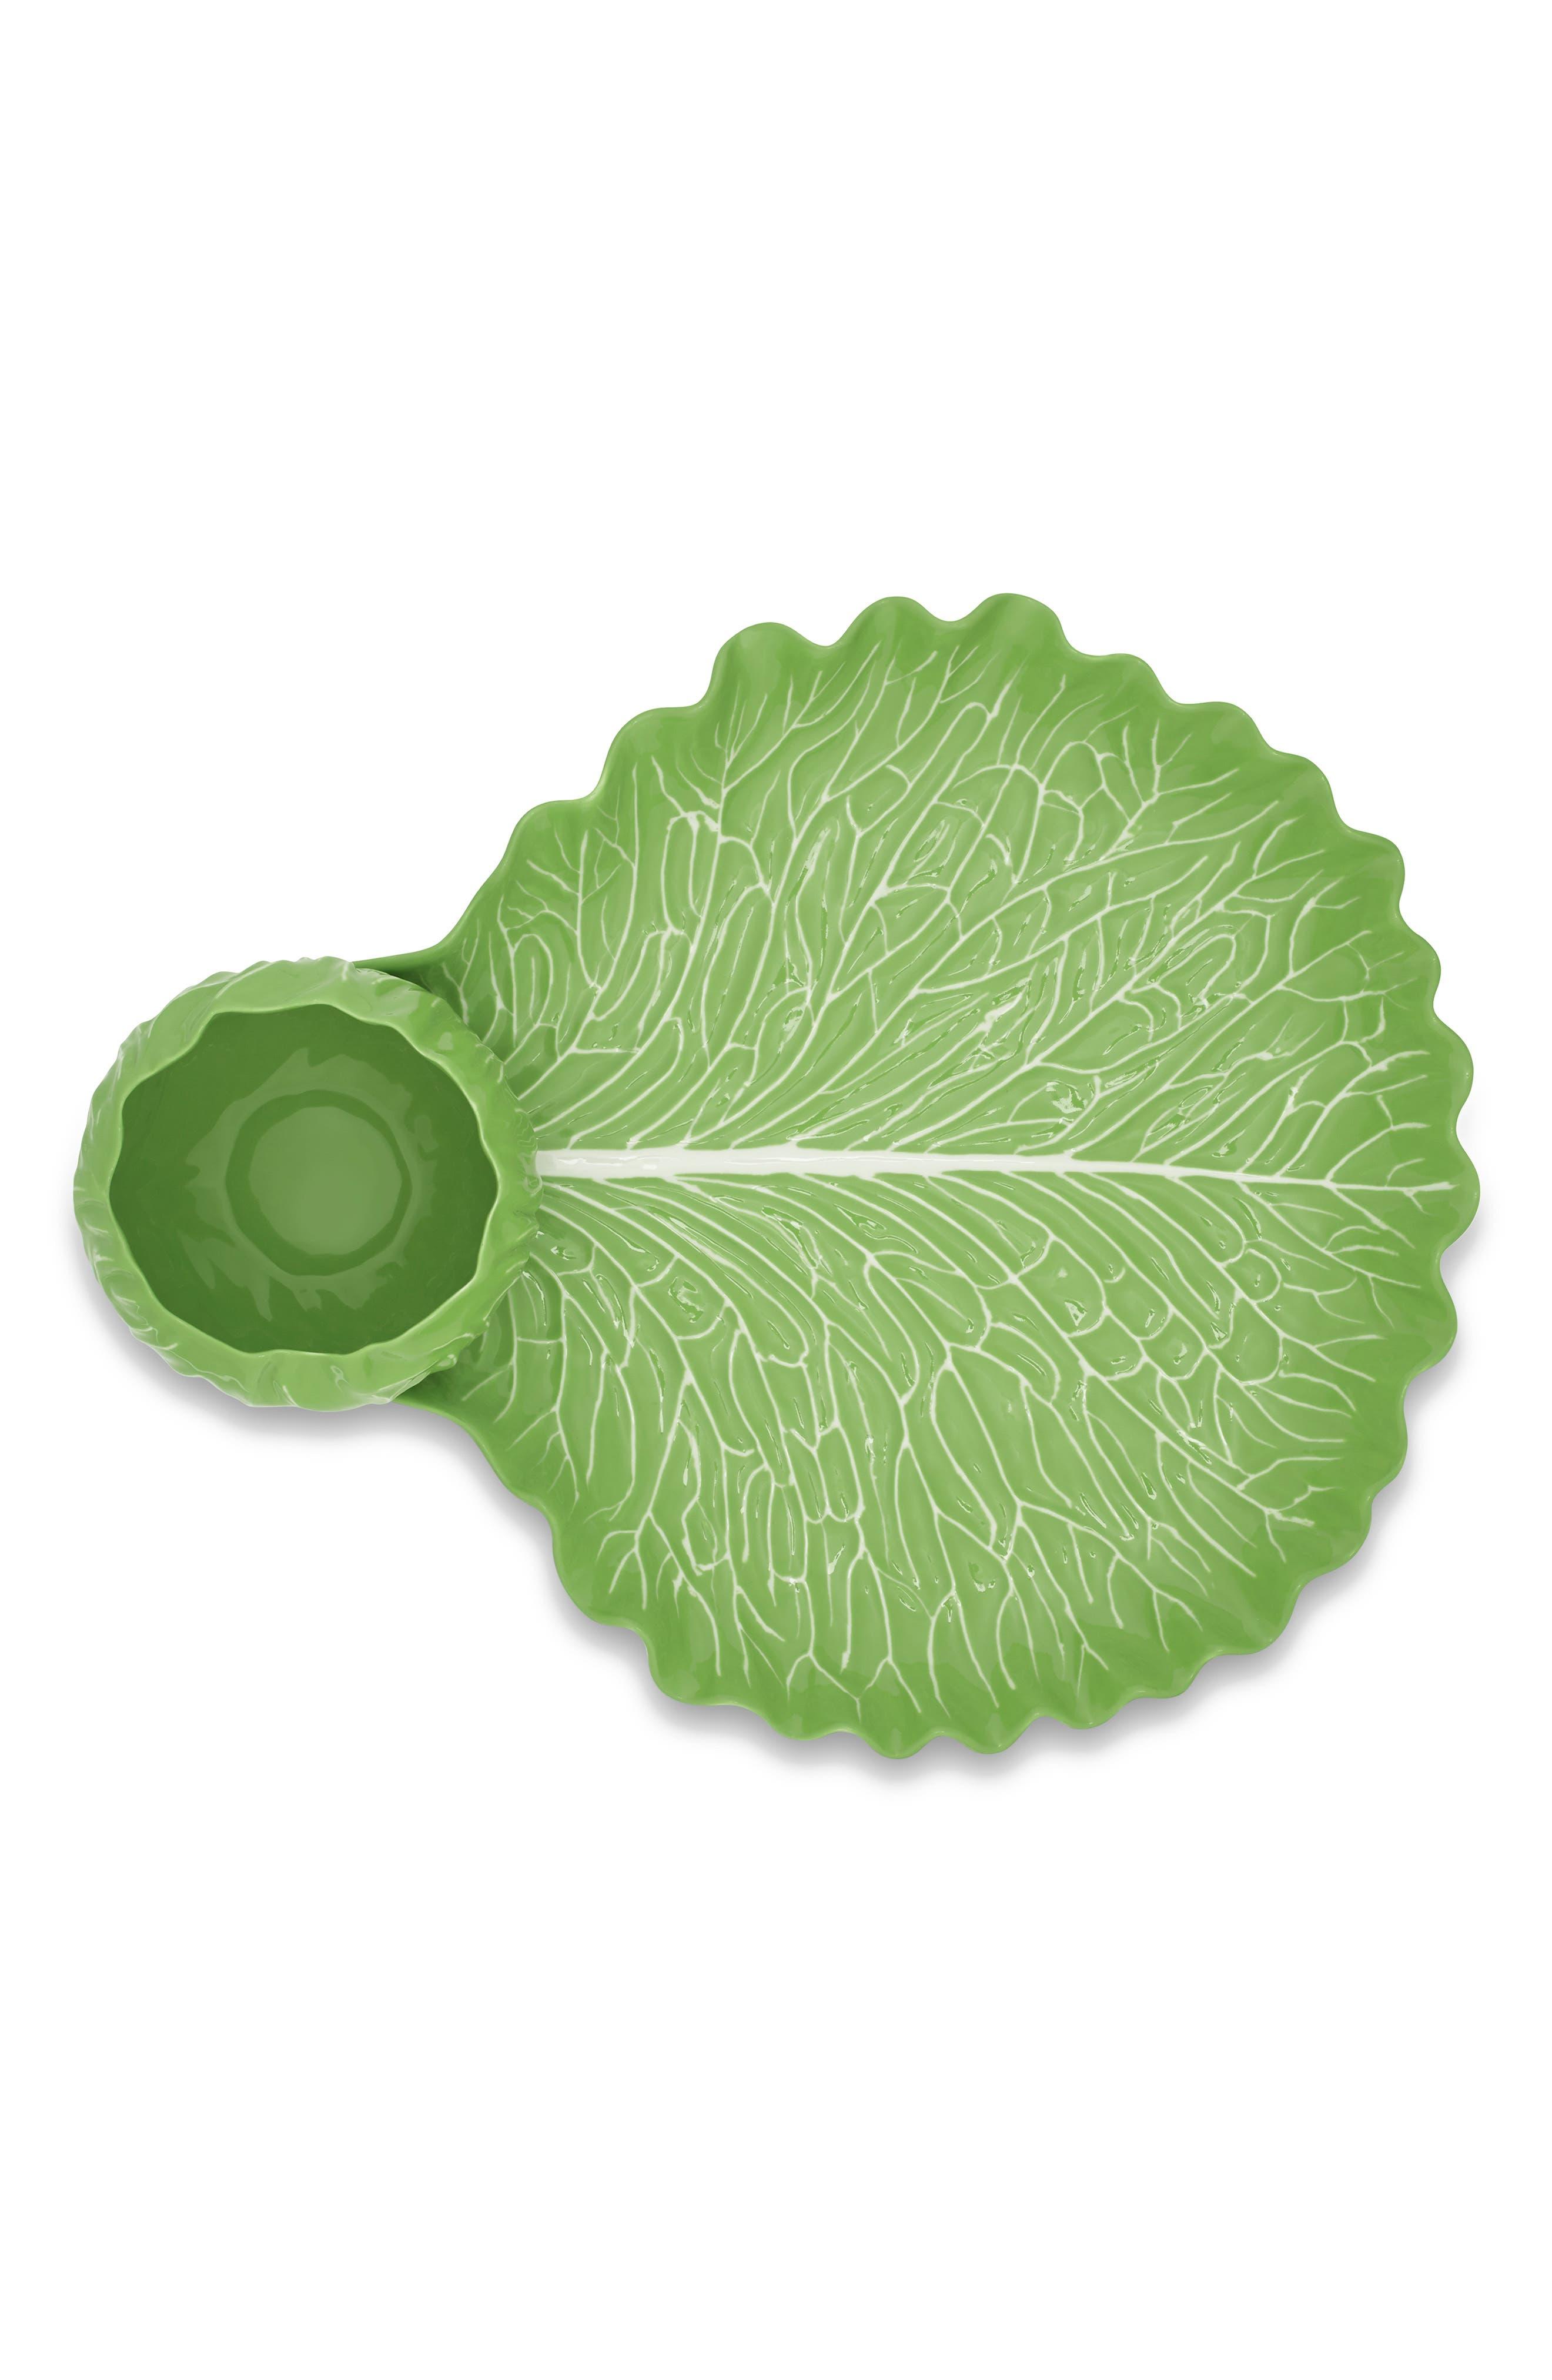 TORY BURCH, Lettuce Ware Crudite Dish, Main thumbnail 1, color, 308